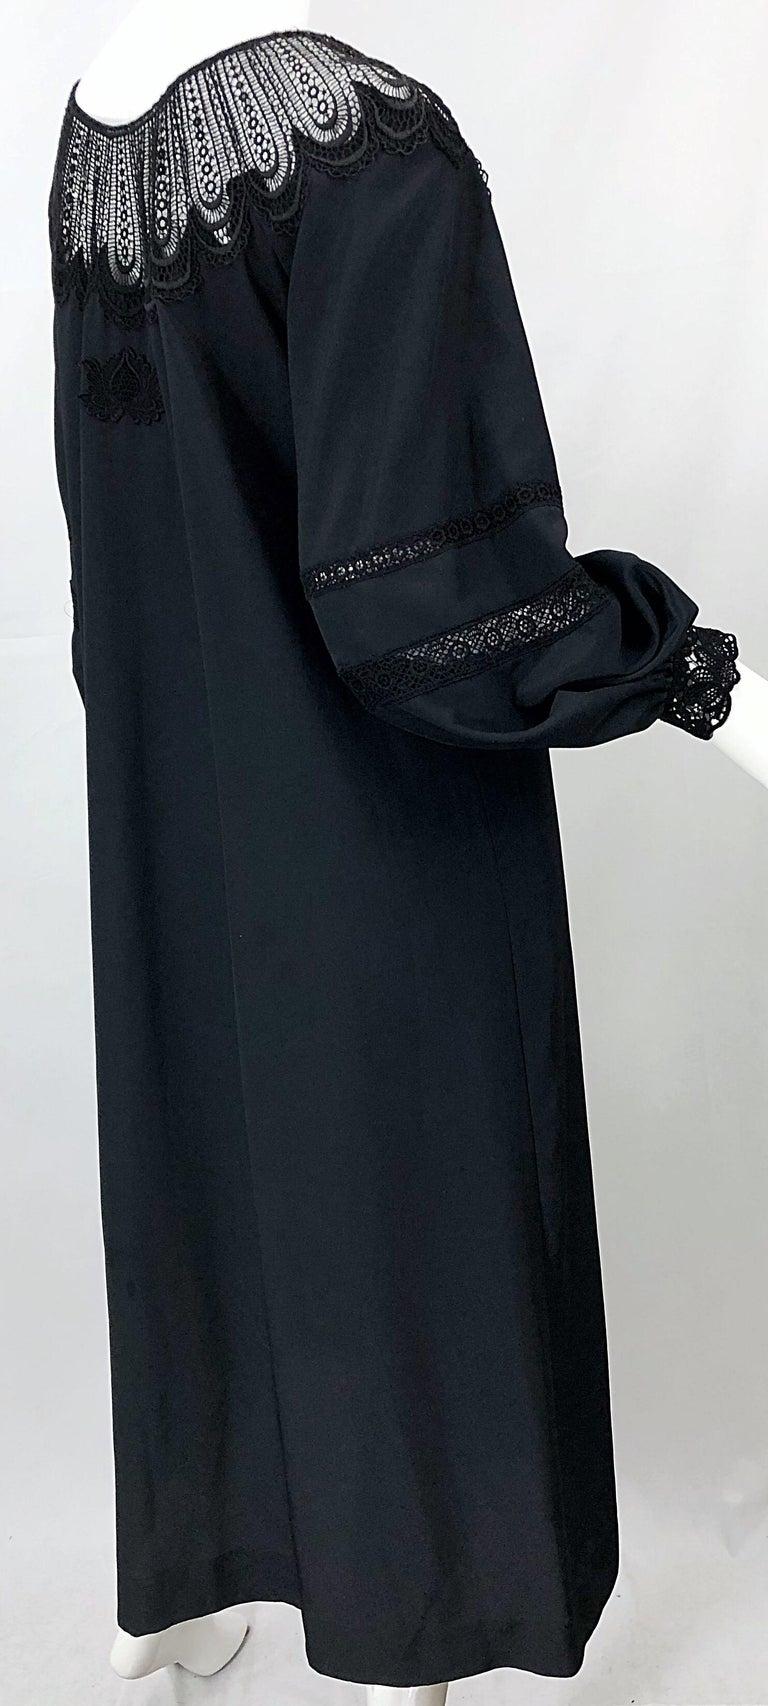 1970s Giorgio di Sant Angelo Black Vintage 70s Crochet Bishop Sleeve Smock Dress For Sale 4